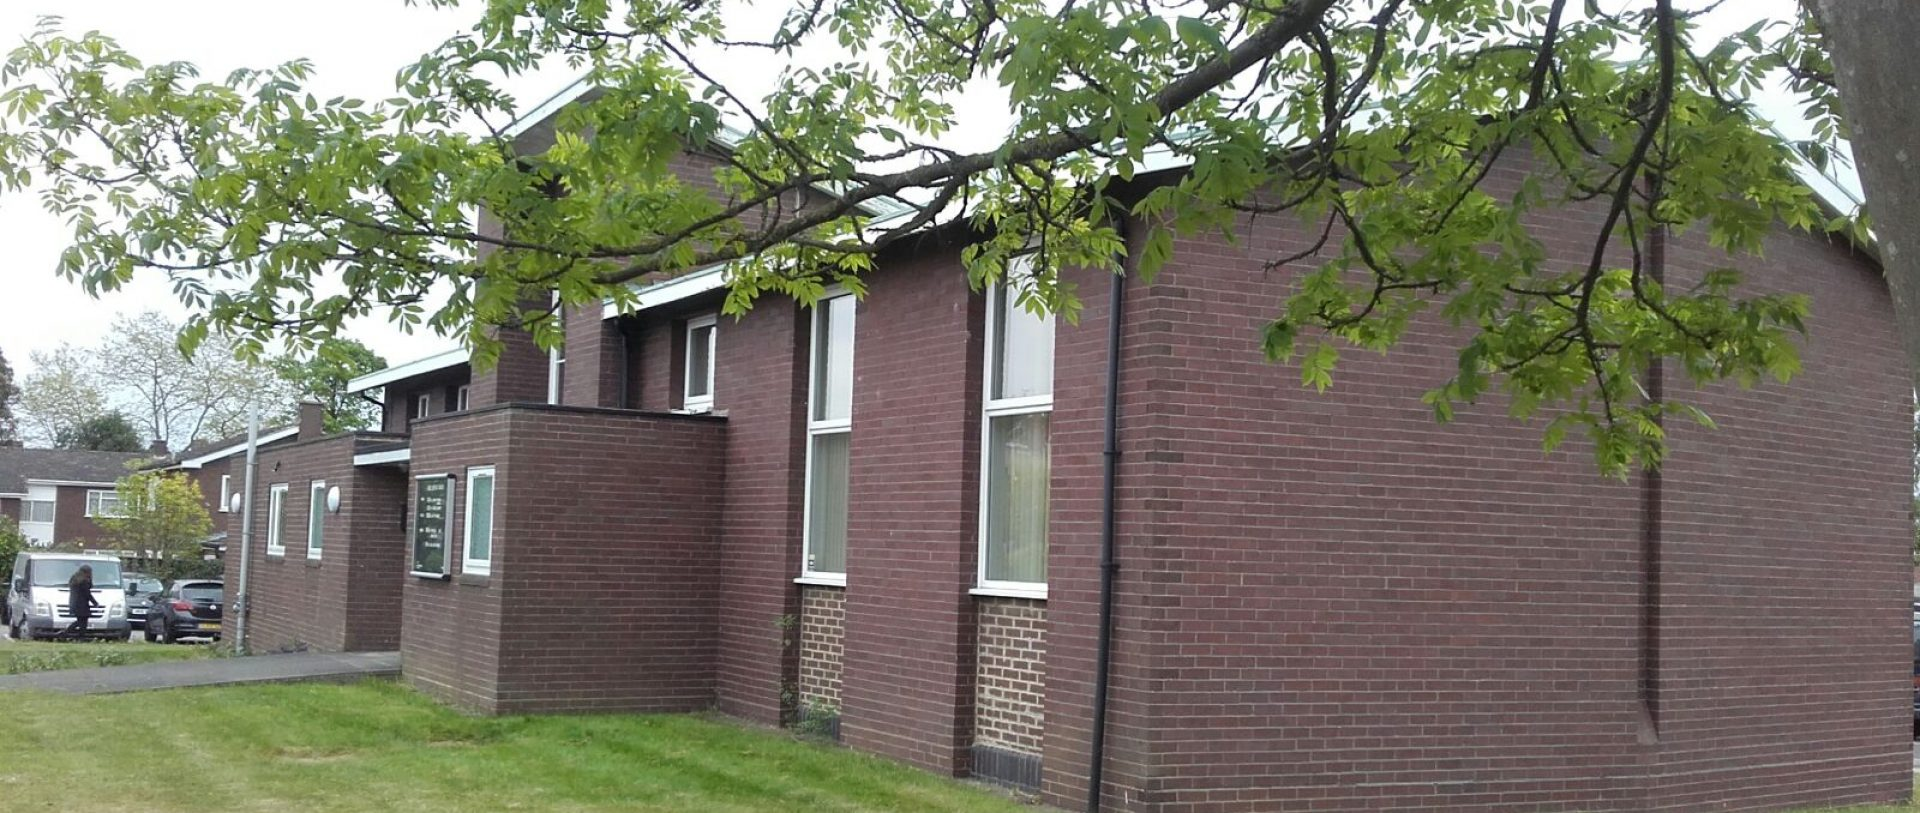 Grace Baptist Church Bexleyheath